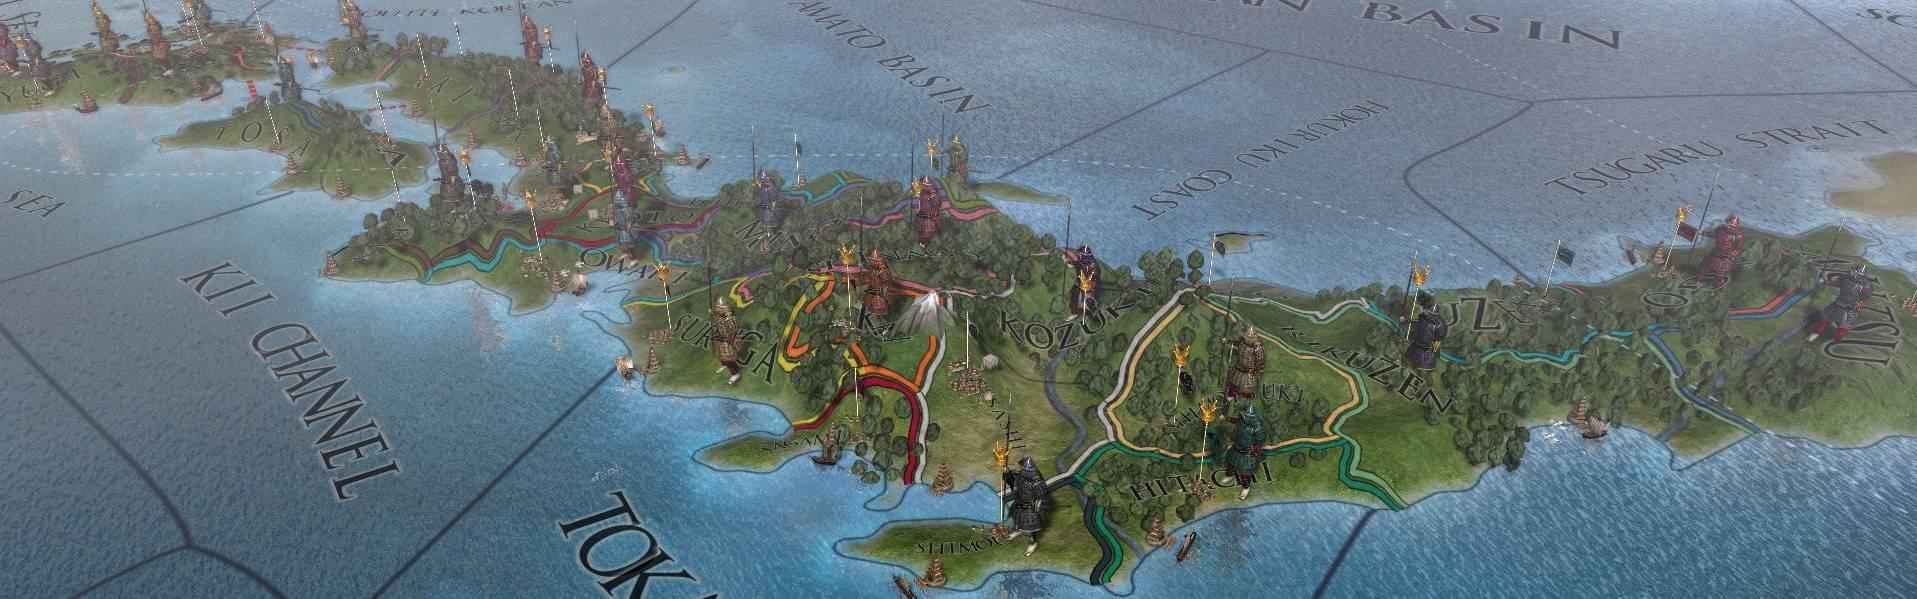 Europa Universalis IV: Mandate of Heaven (DLC) Steam Key GLOBAL